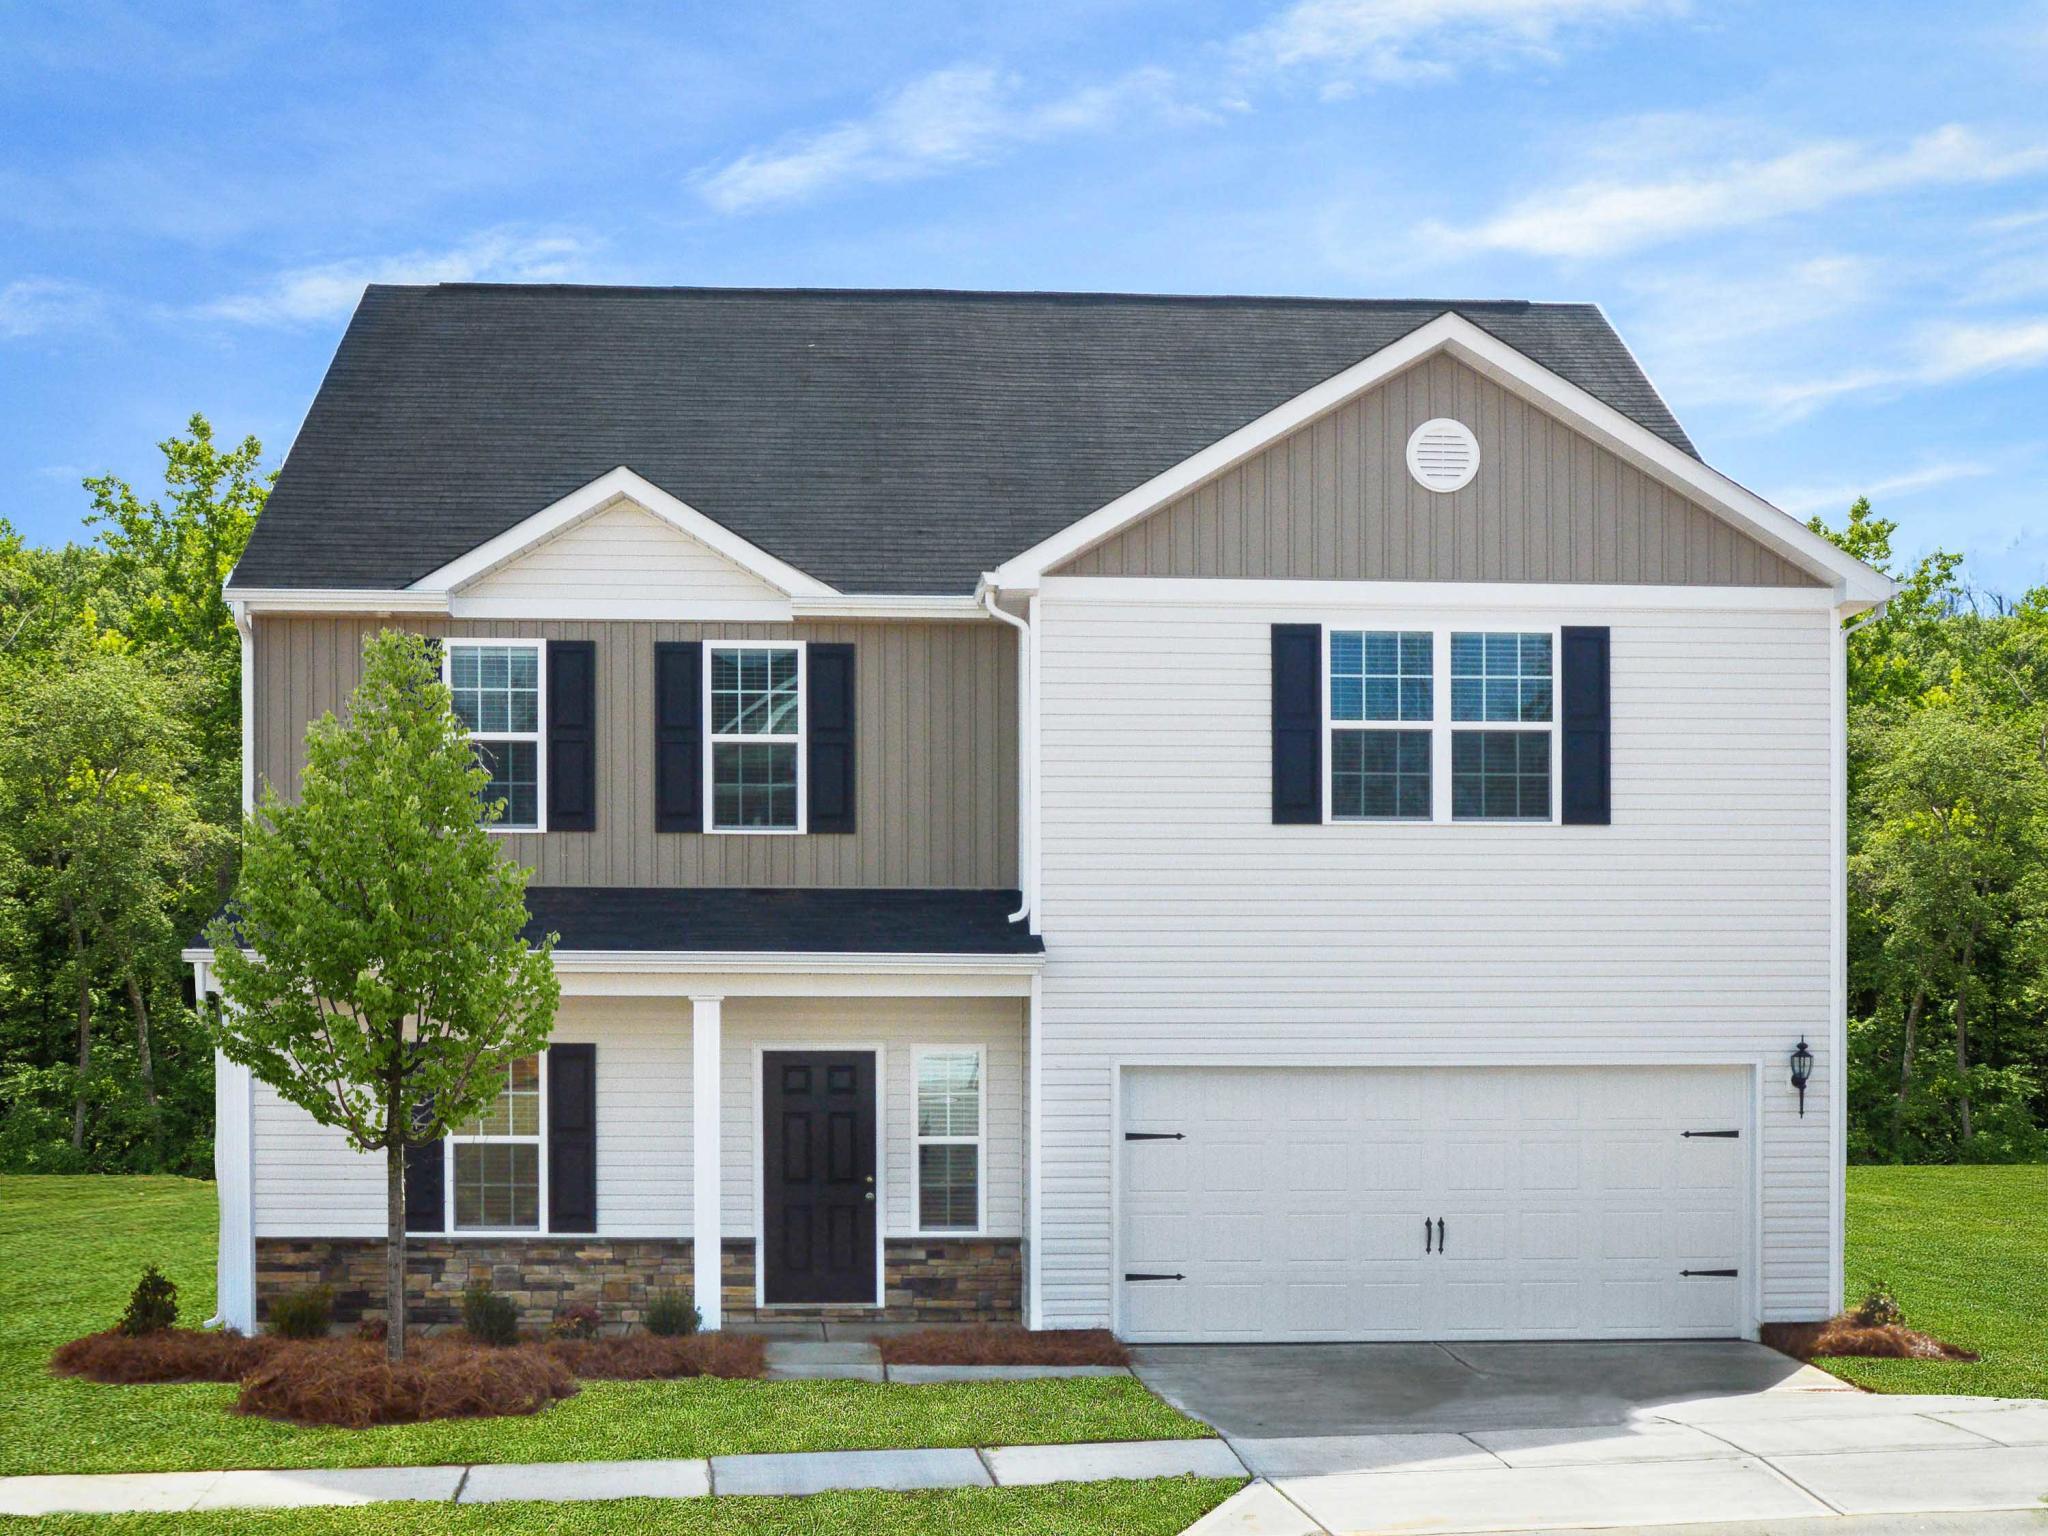 Madison Plan For Sale Charlotte NC